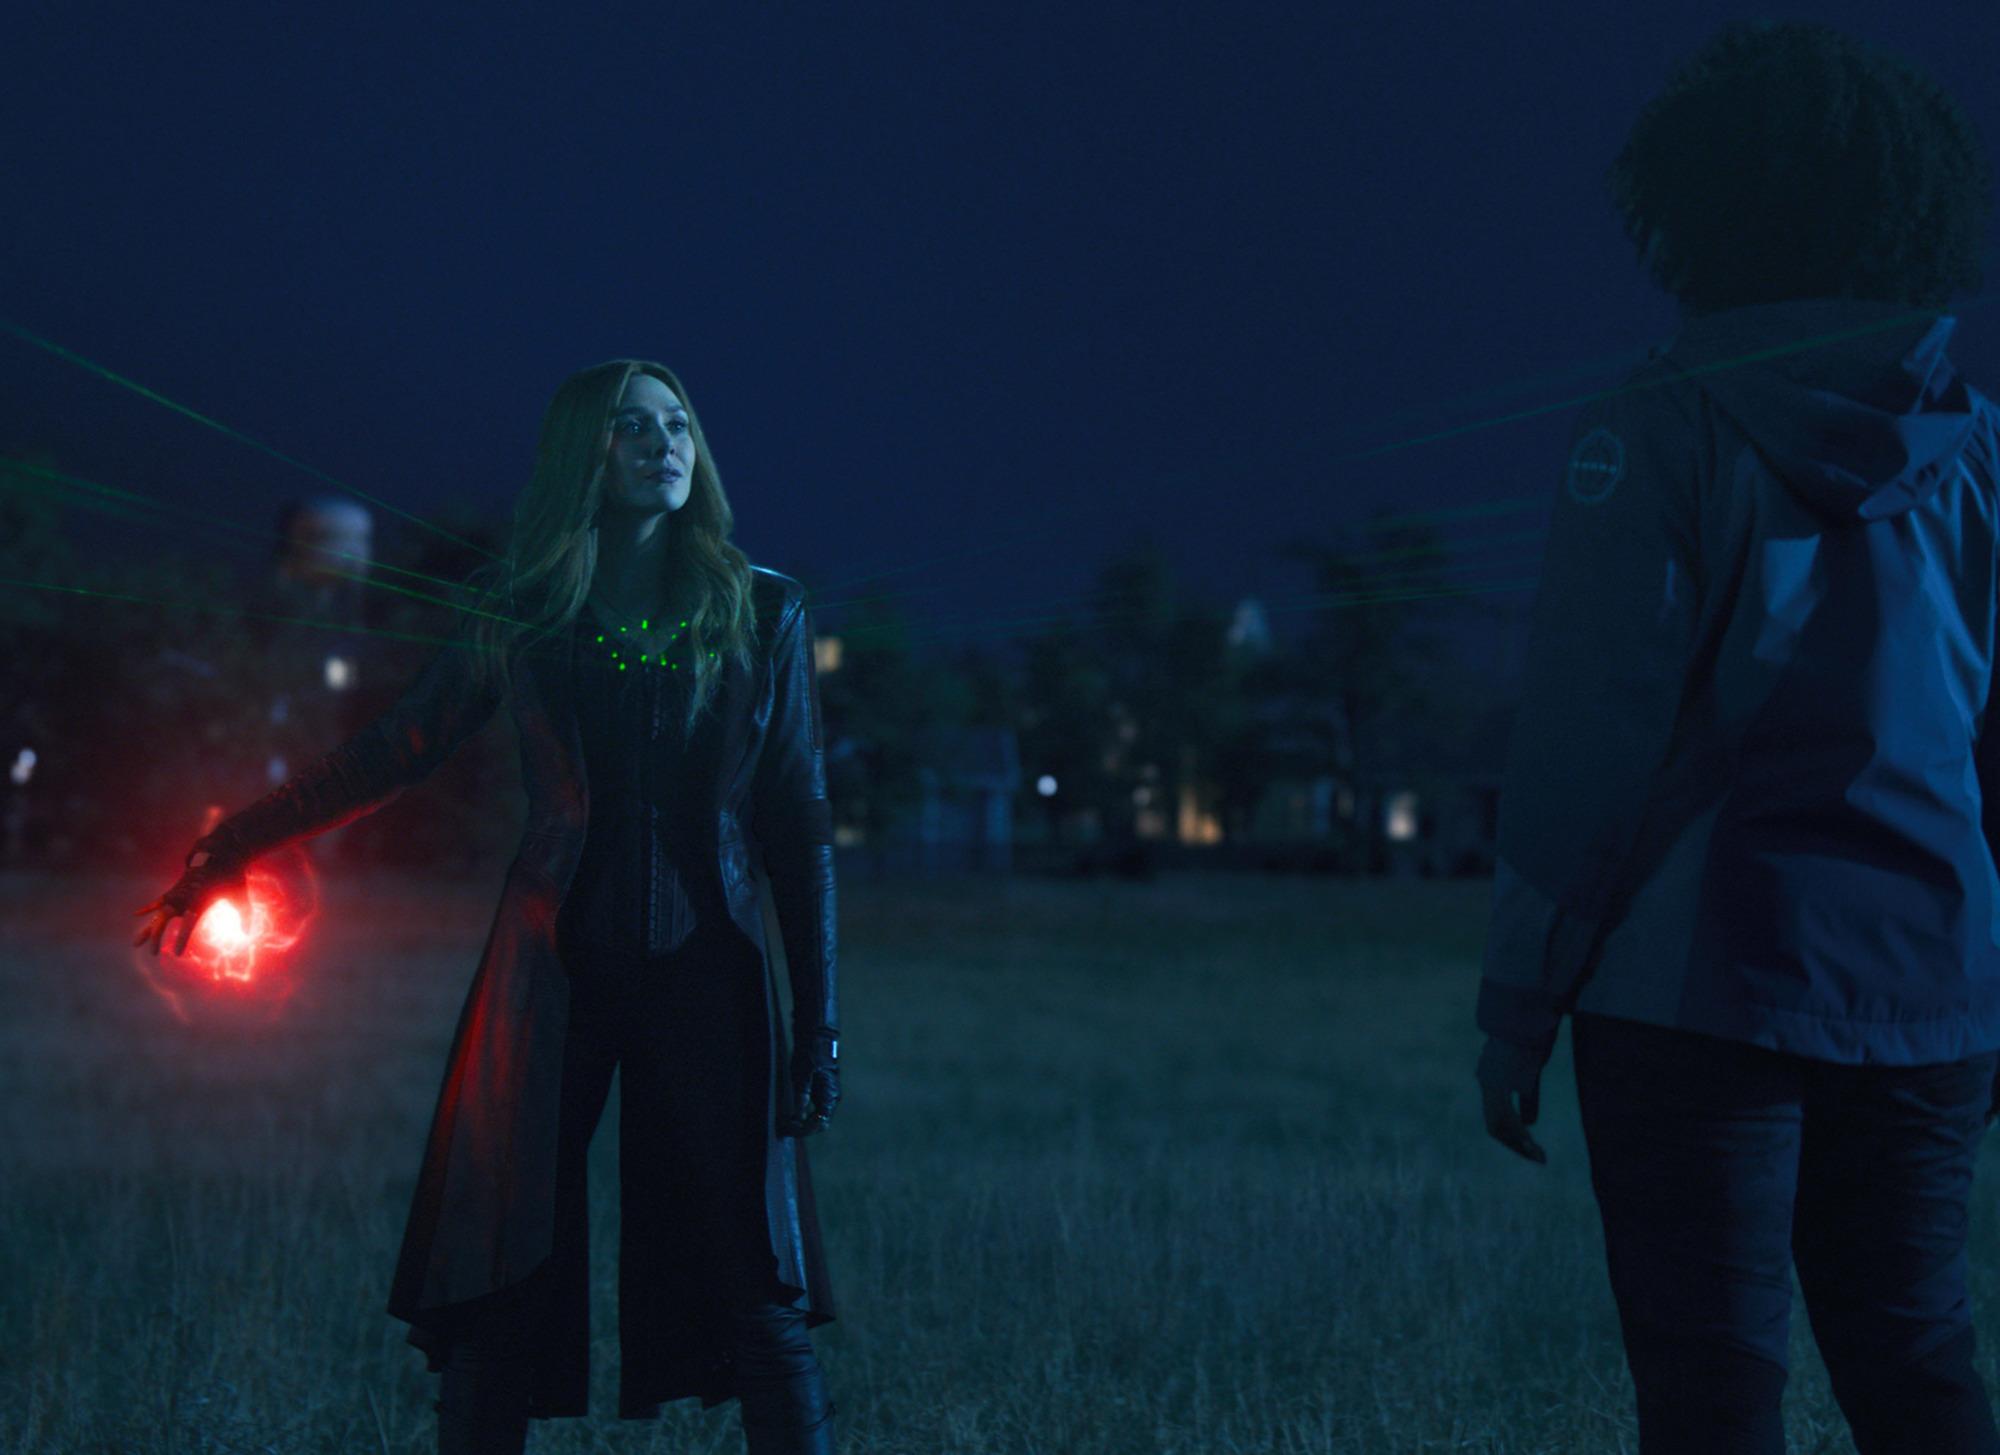 Elizabeth Olsen as Wanda Maximoff in 'WandaVision' | Marvel Studios